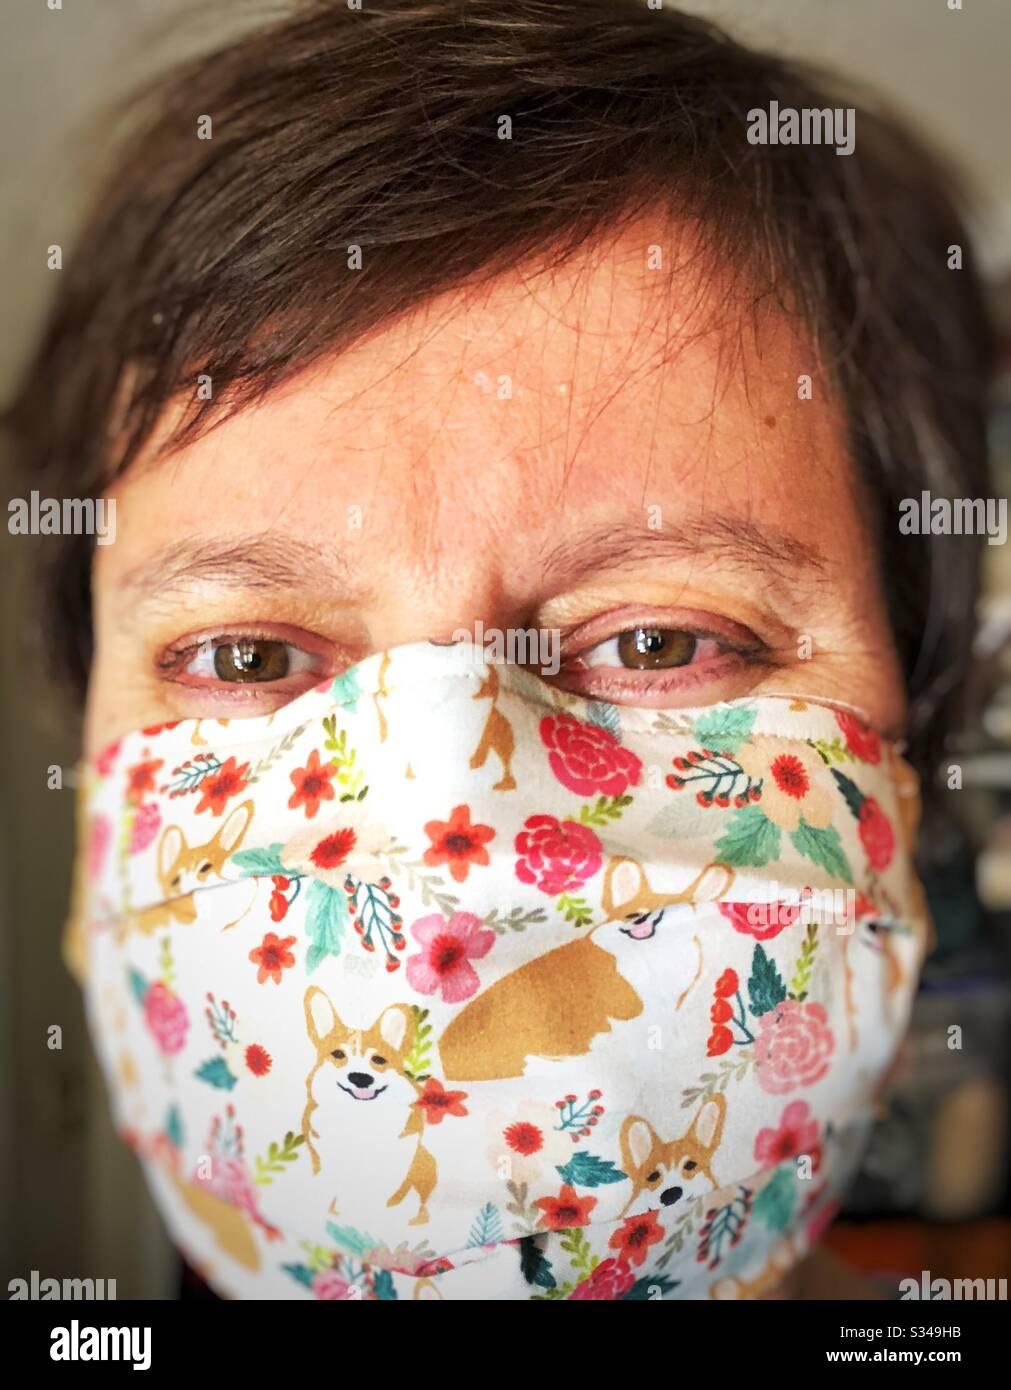 Mascarilla facial divertida de Corgis hecha a mano para protegerla de los covid19 Foto de stock